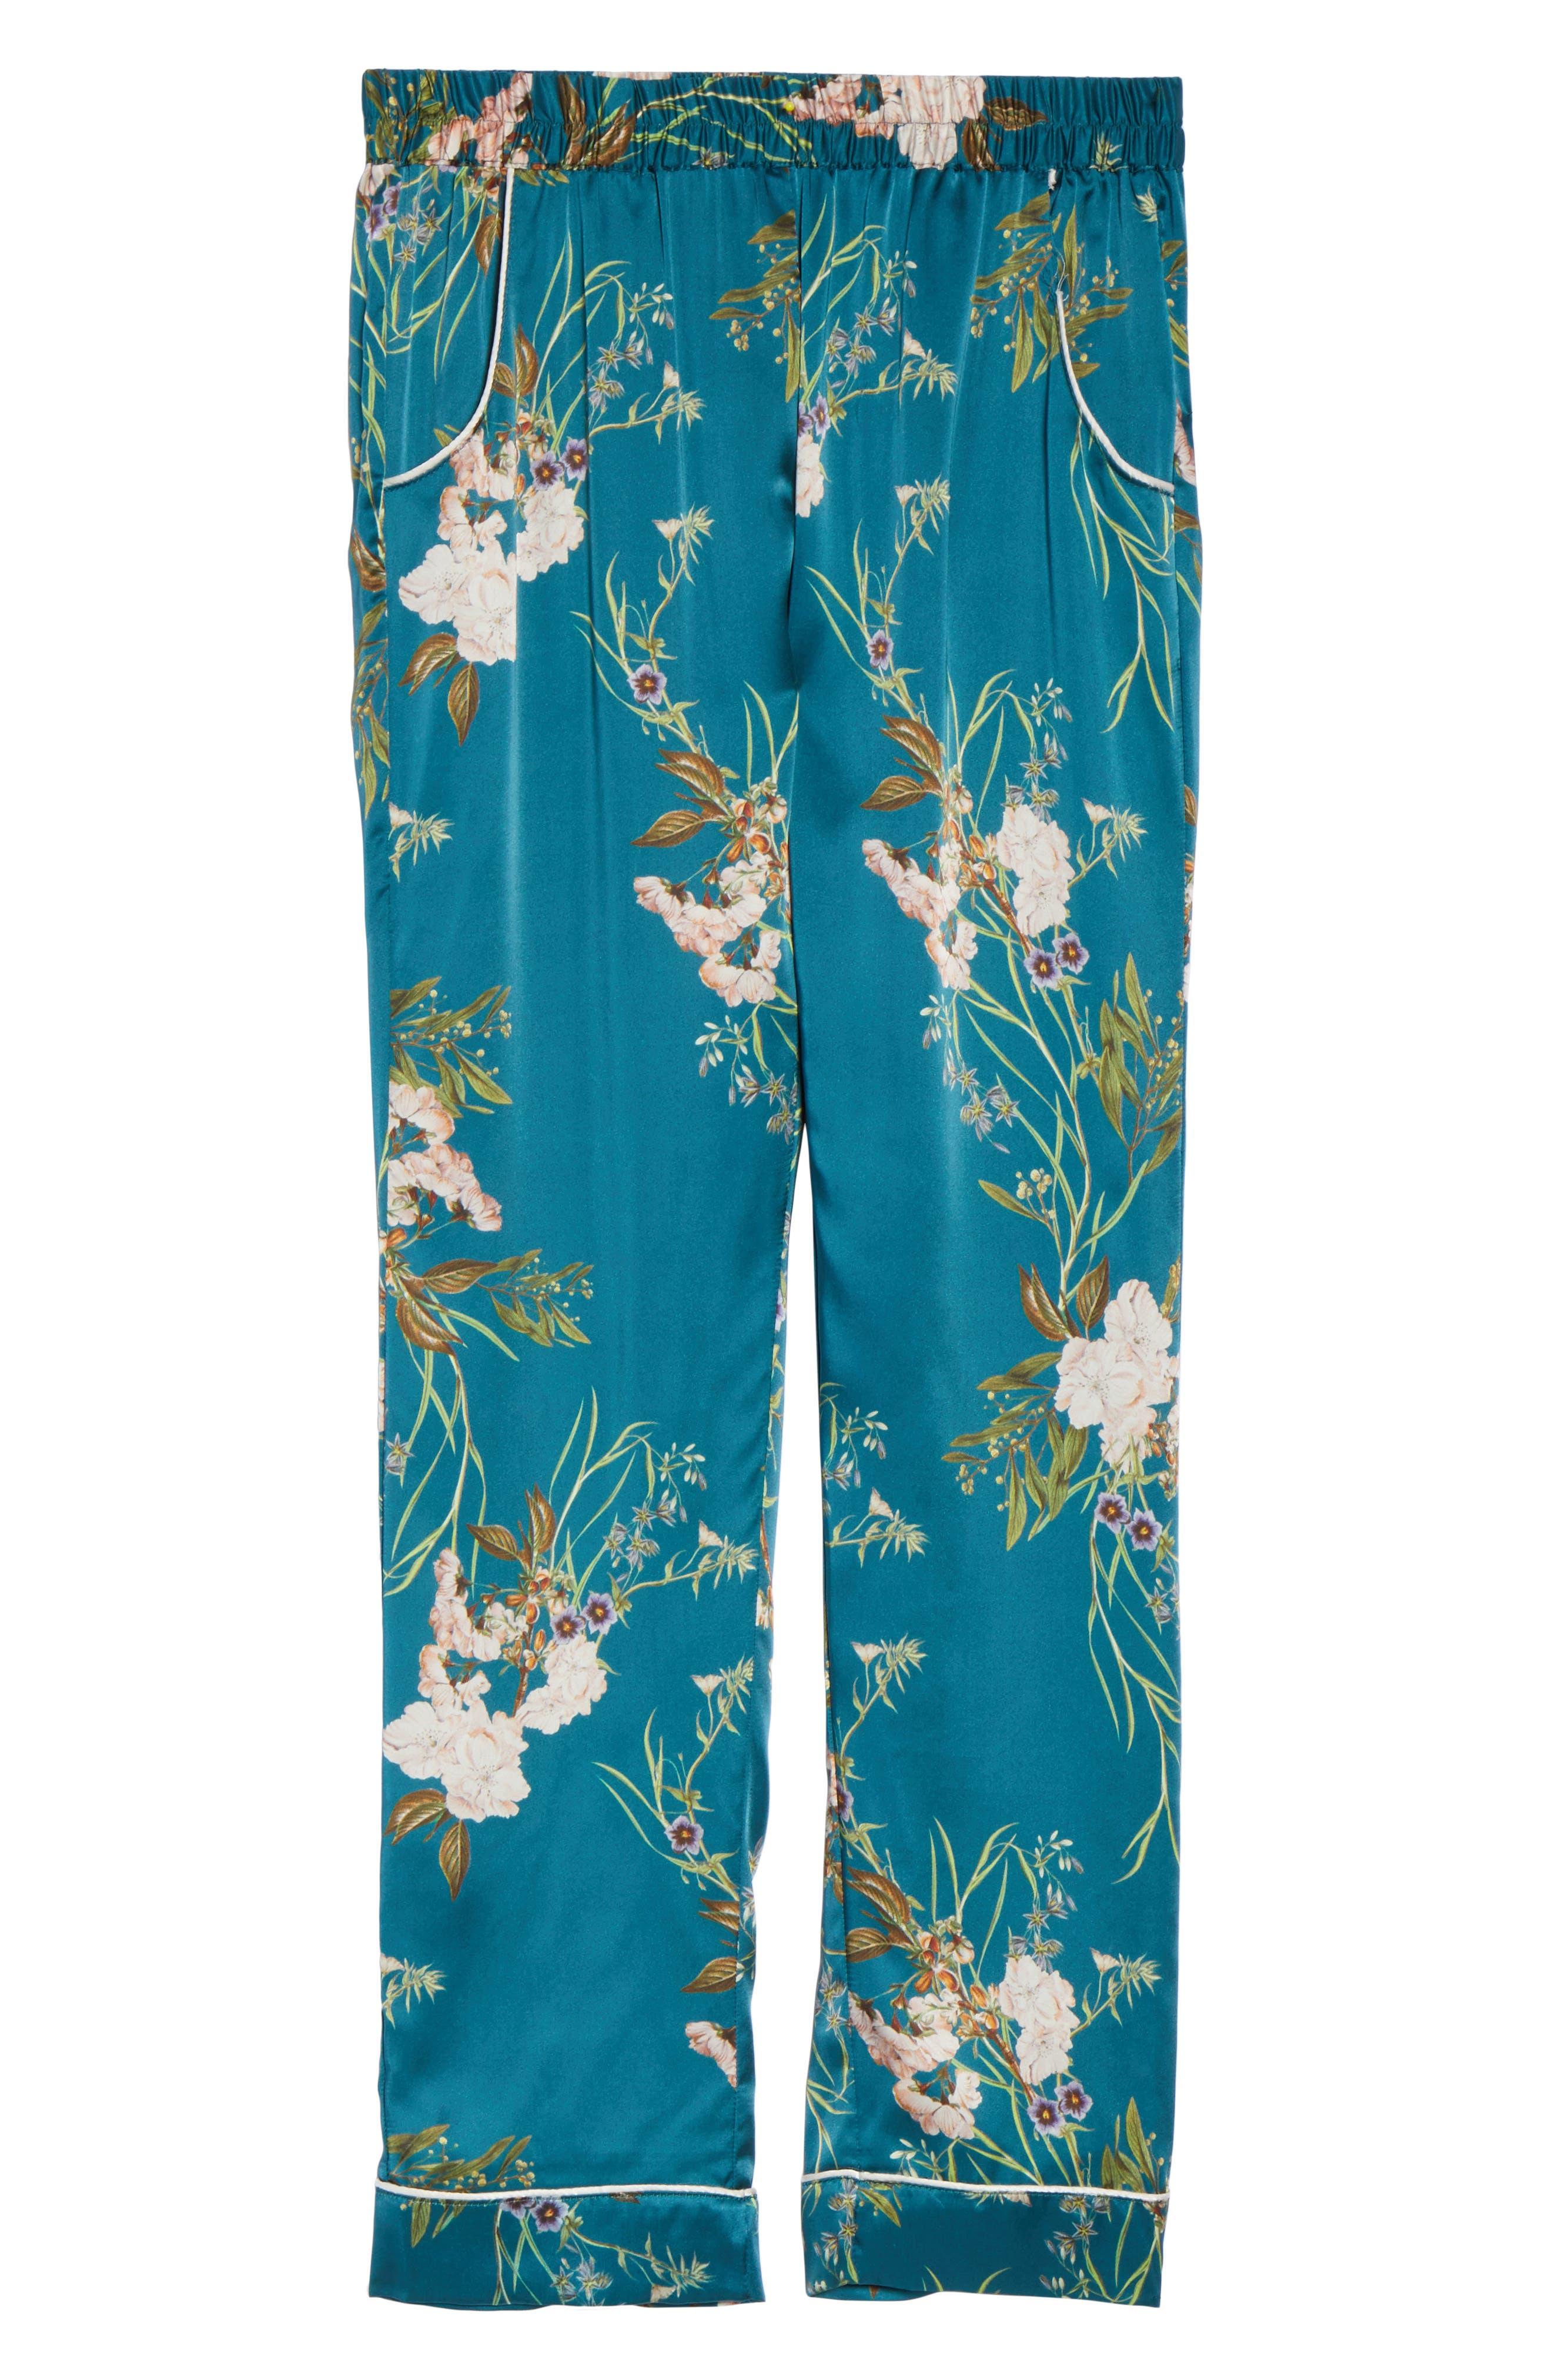 Alexandra Silk Pajama Pants,                             Alternate thumbnail 4, color,                             Teal Floral